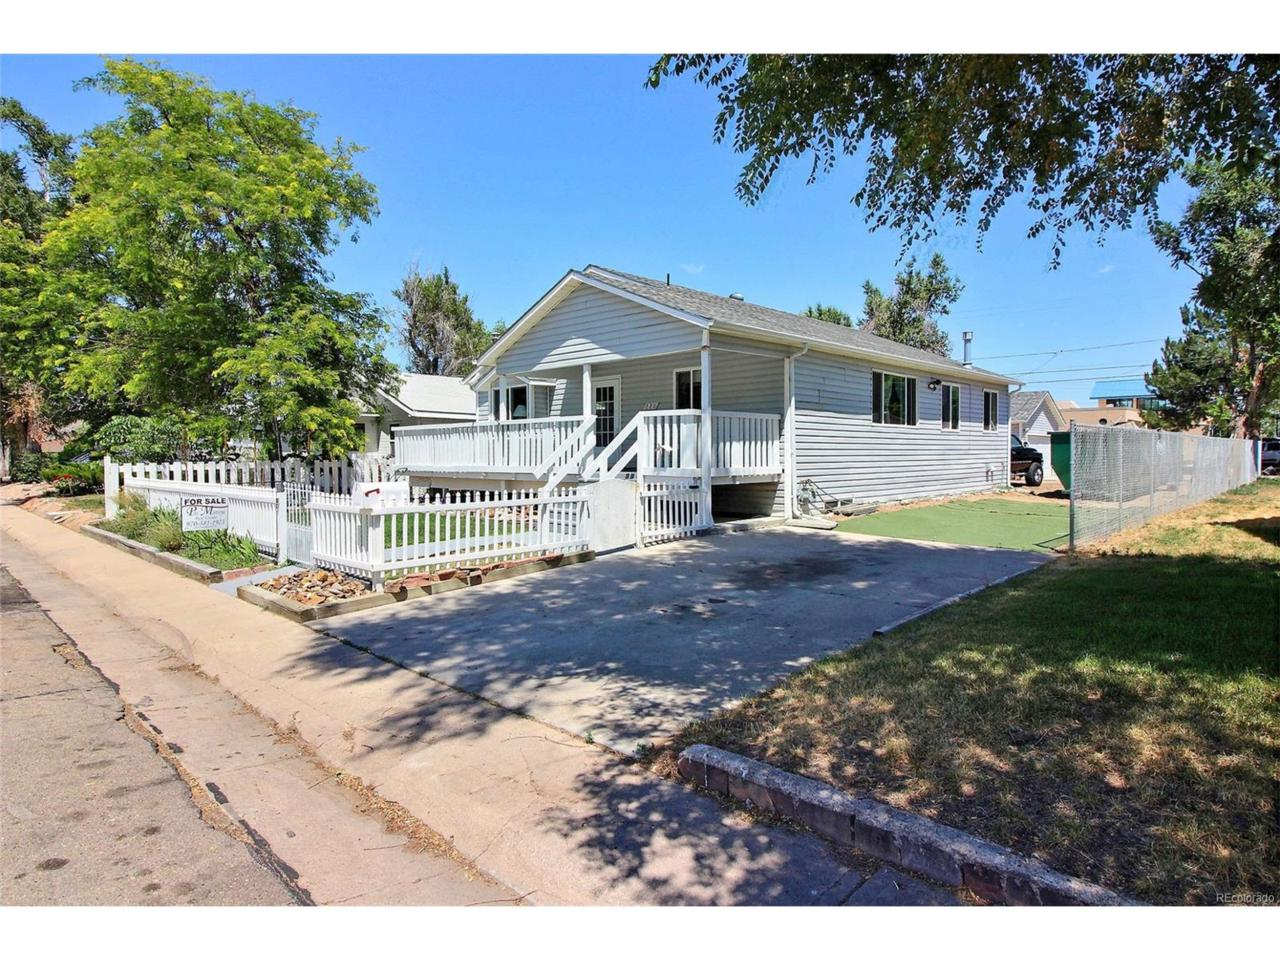 220 Harrison Avenue, Fort Lupton, CO 80621 (MLS #9767588) :: 8z Real Estate